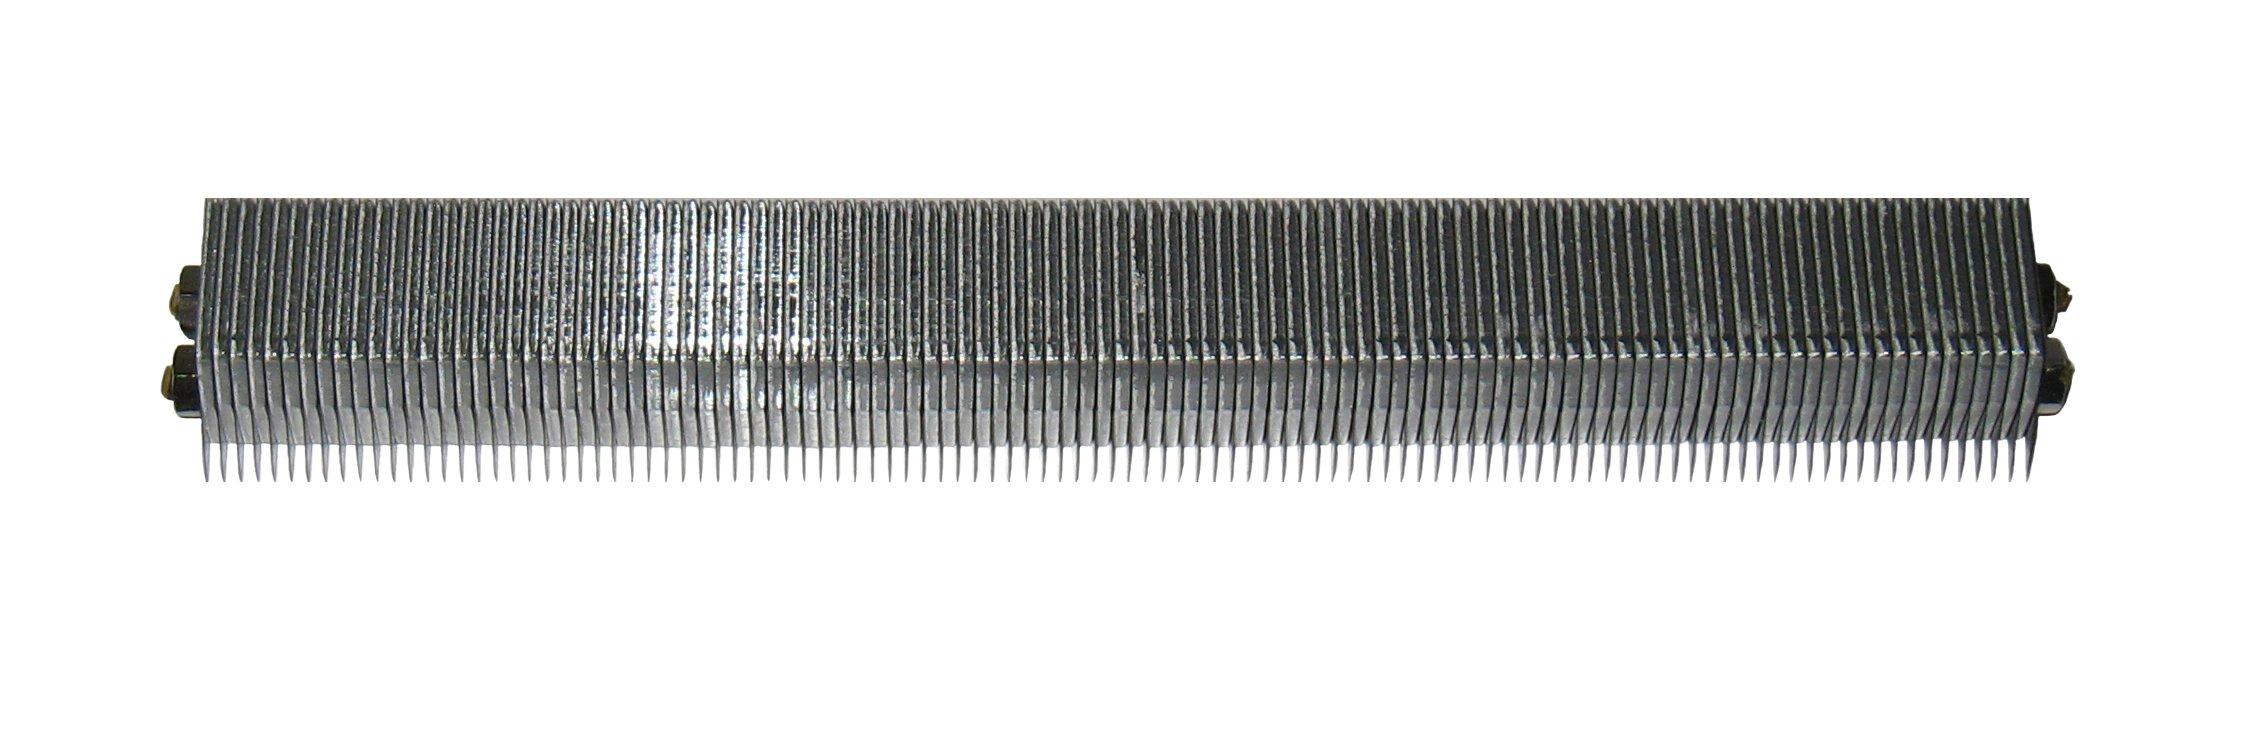 Wife gang 1.0mm for the cutter NK20D ? DX70 ? ET20